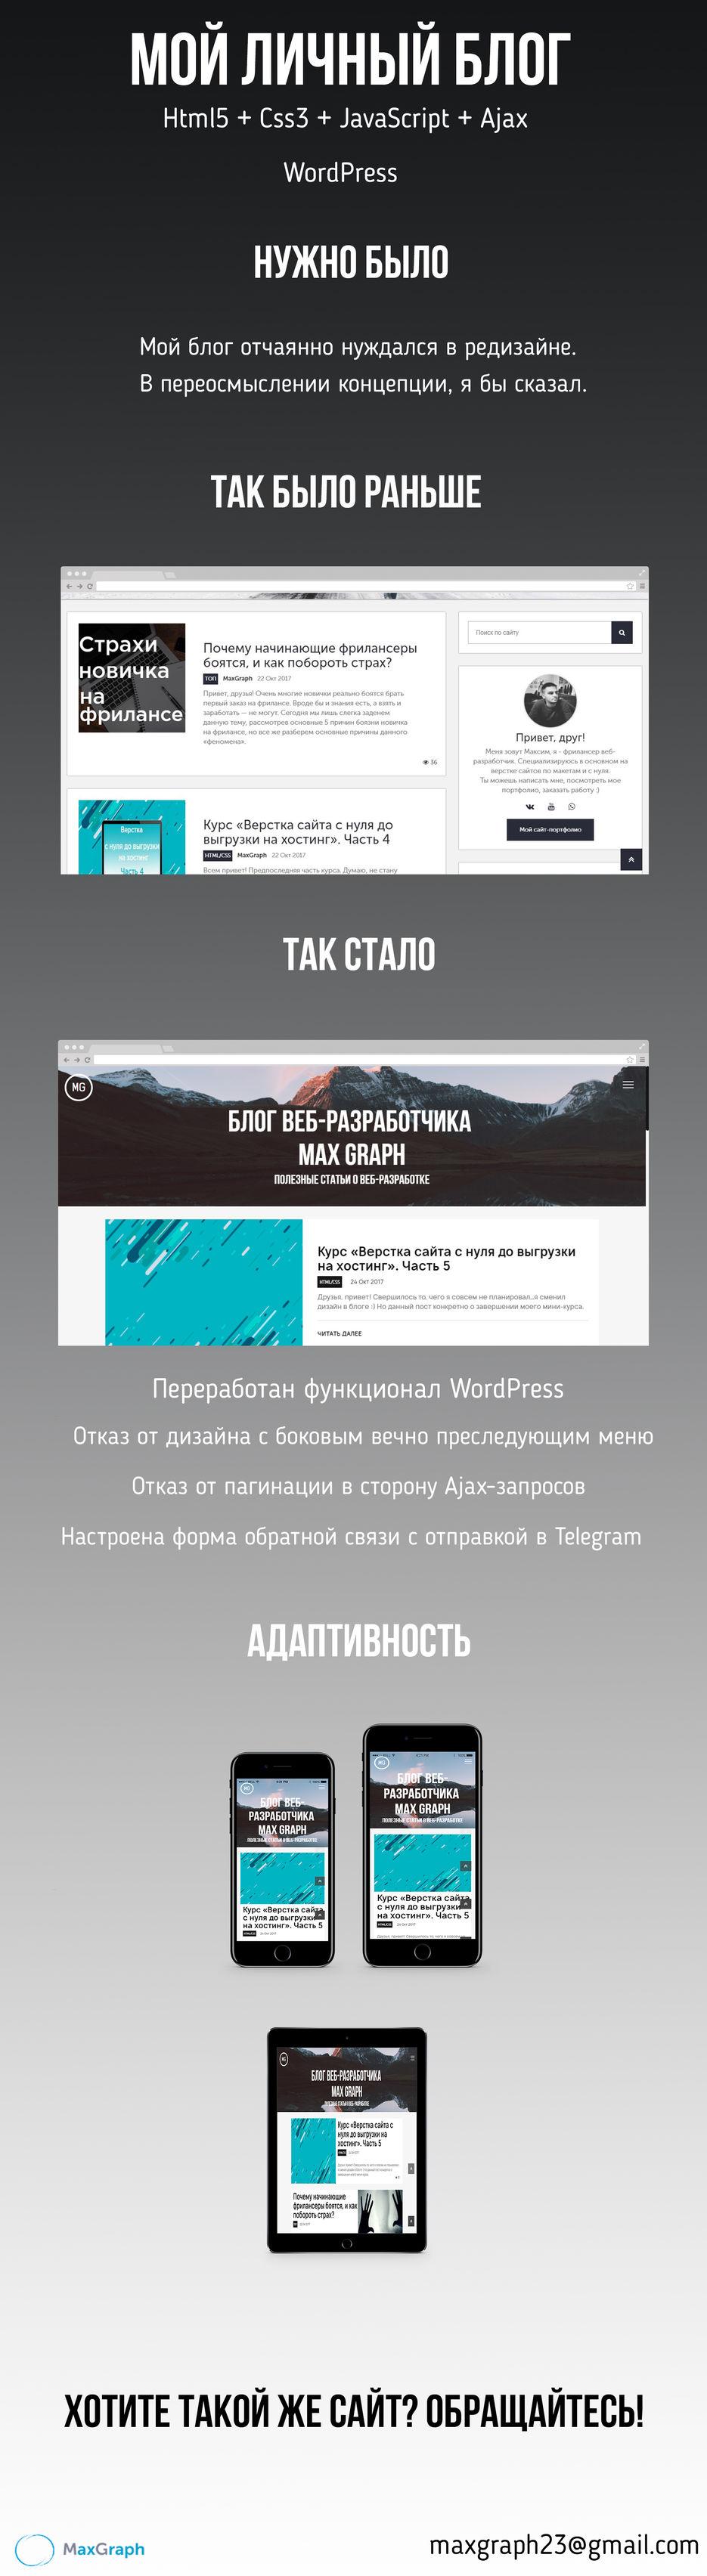 Блог веб-разработчика